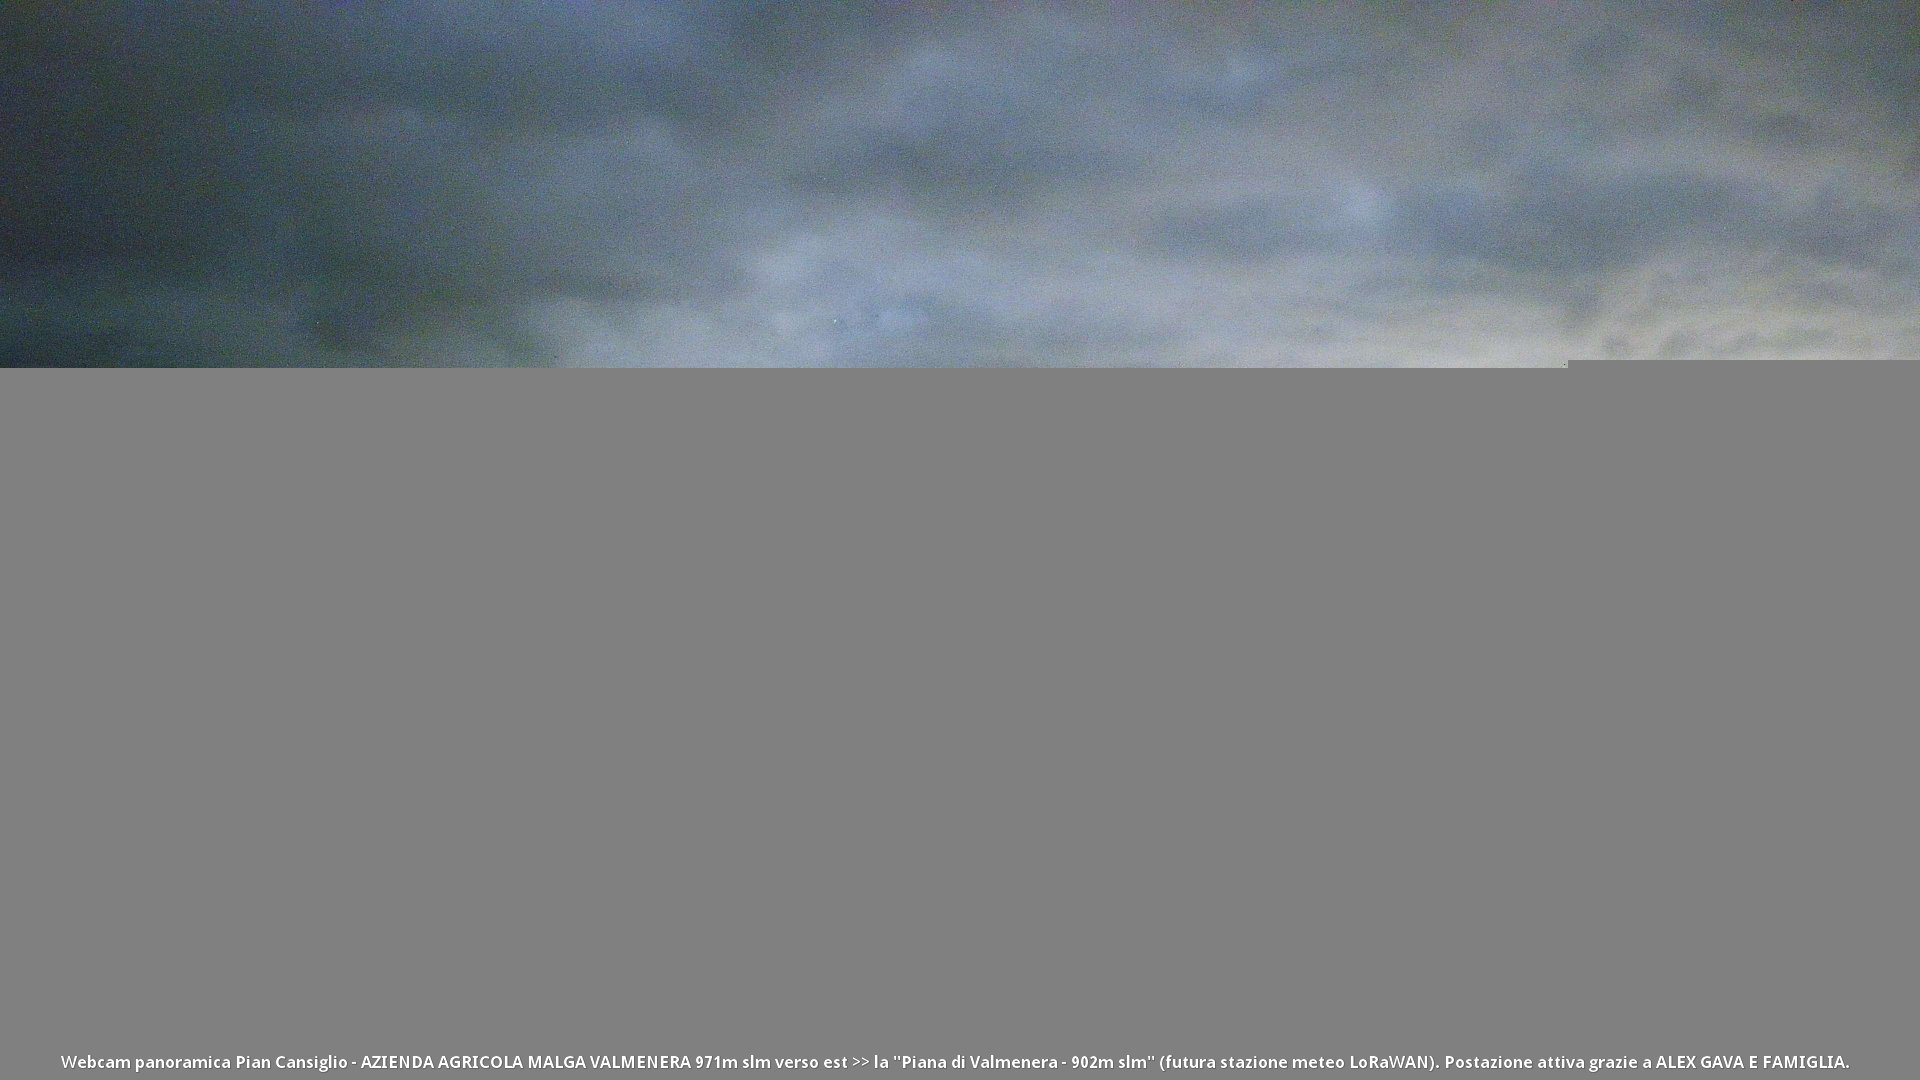 time-lapse frame, Pian Cansiglio - Malga Valmenera webcam